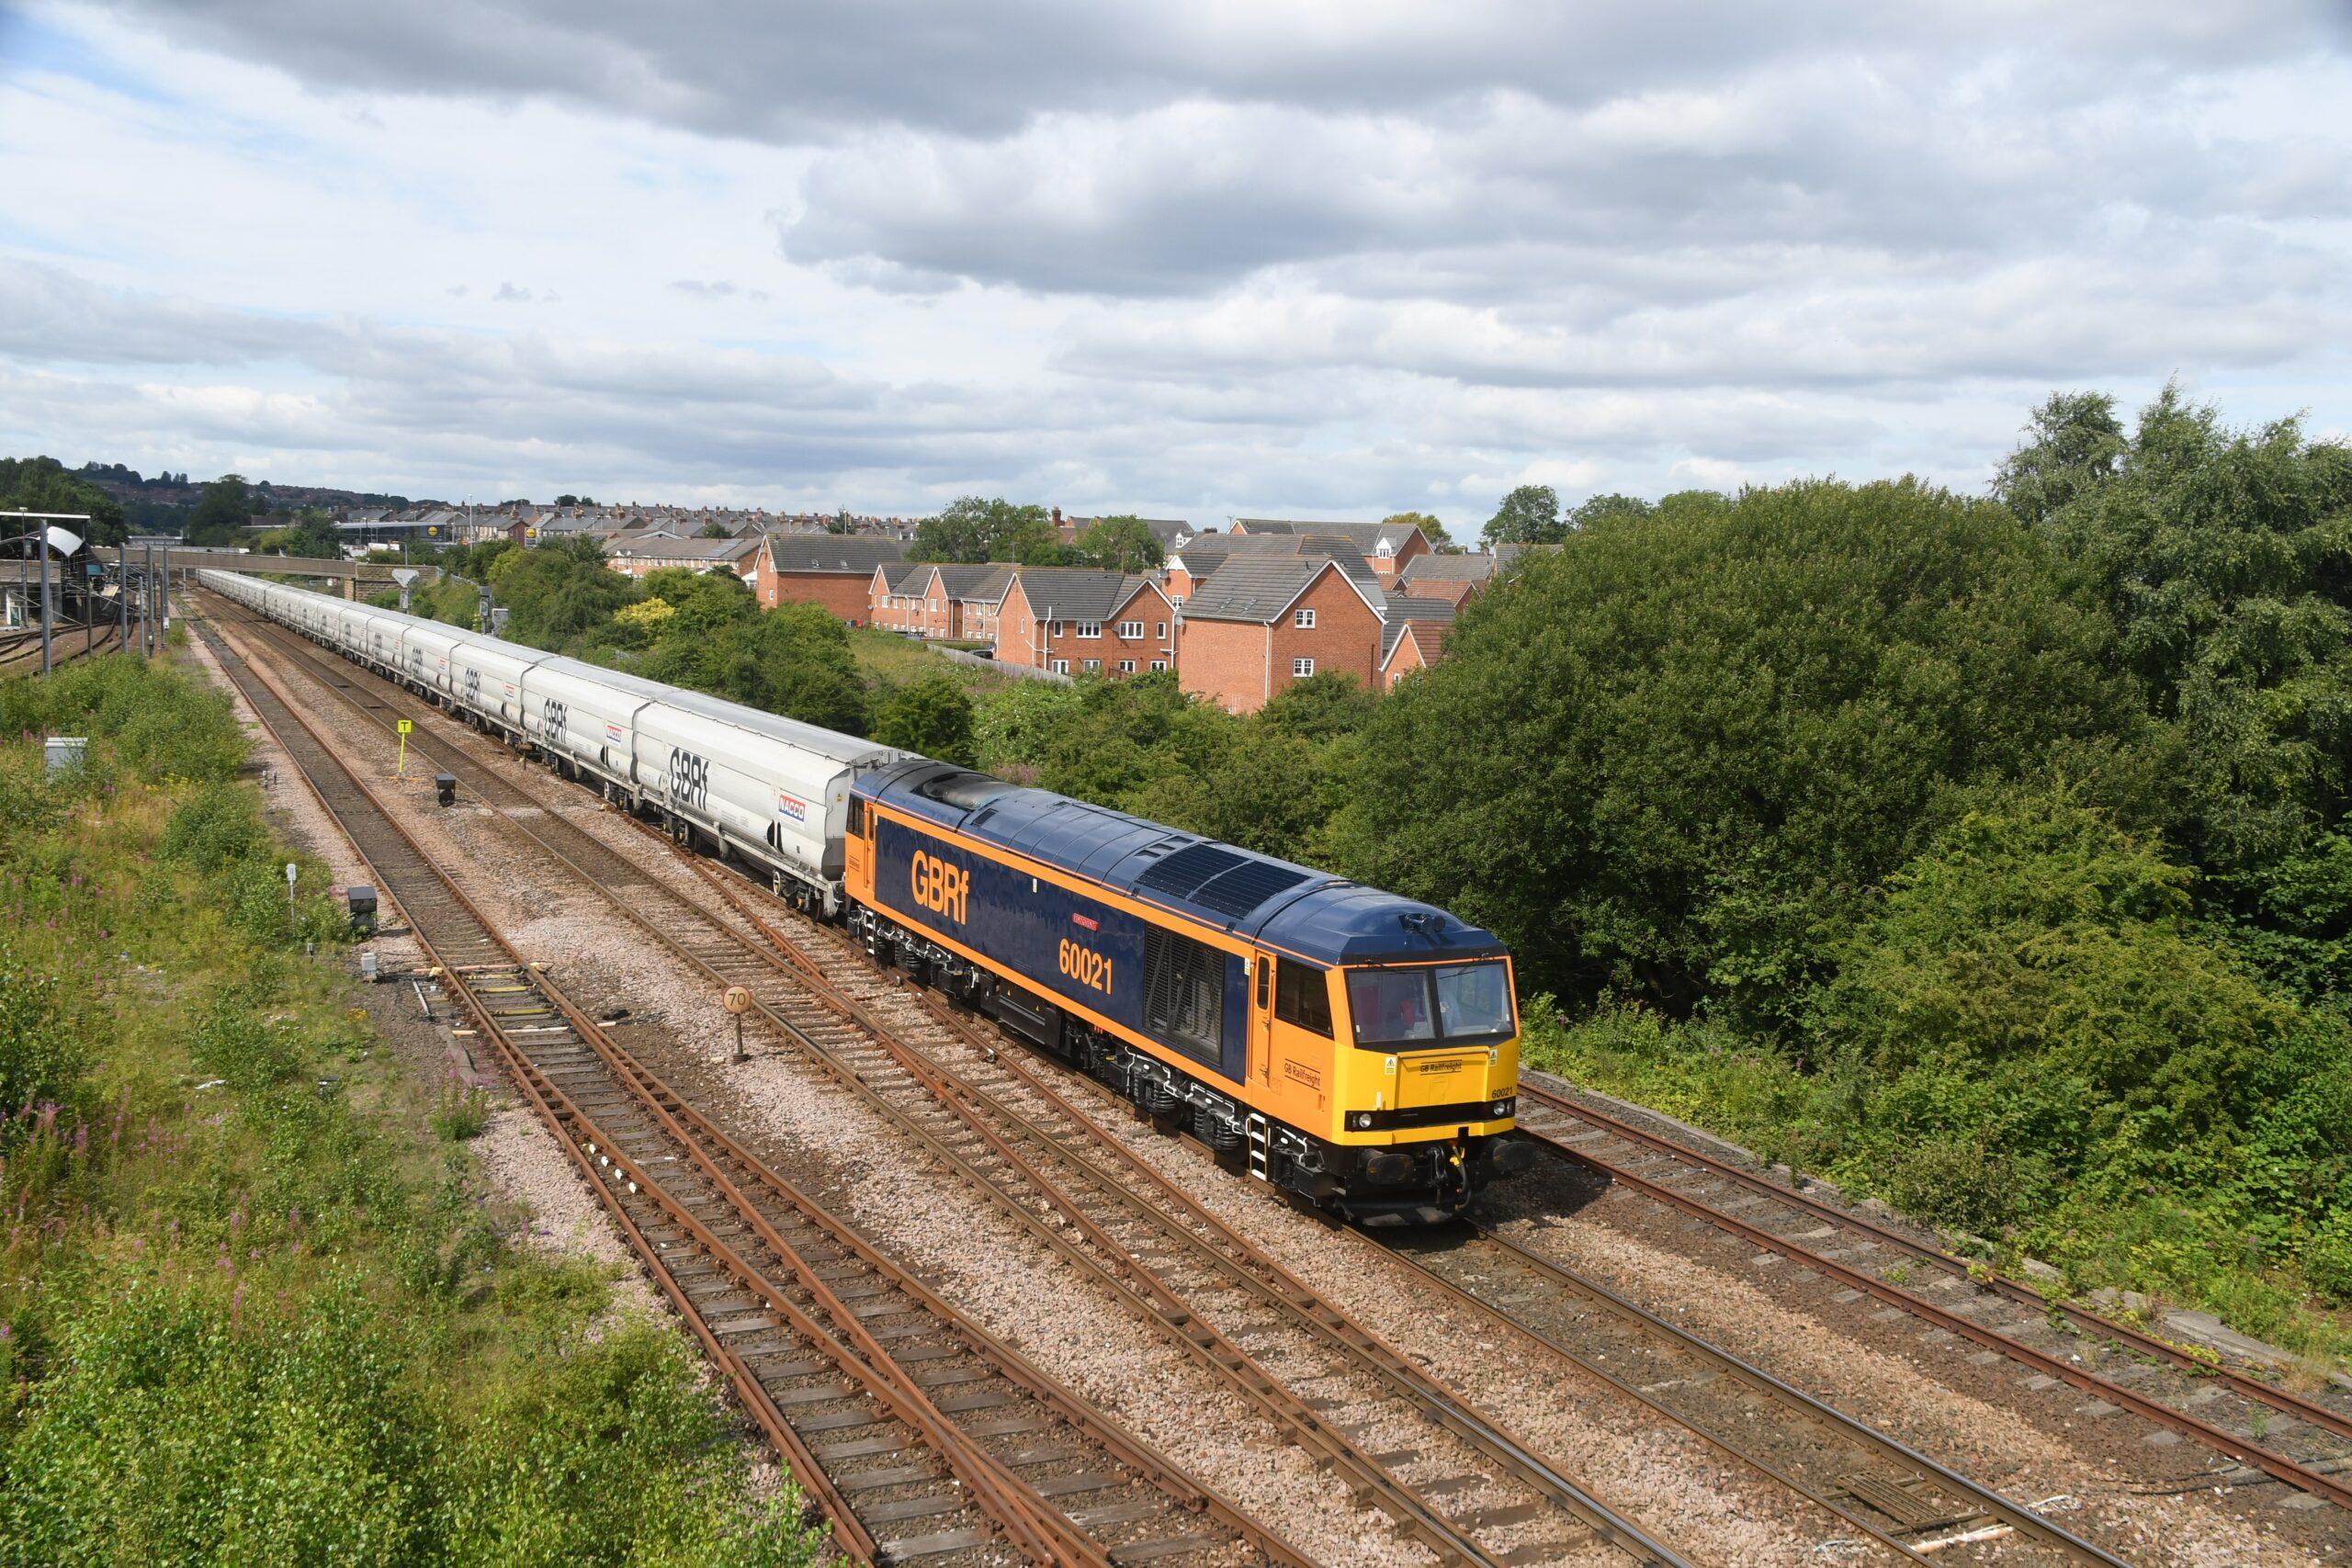 GB Railfreight Class 60 locomotive